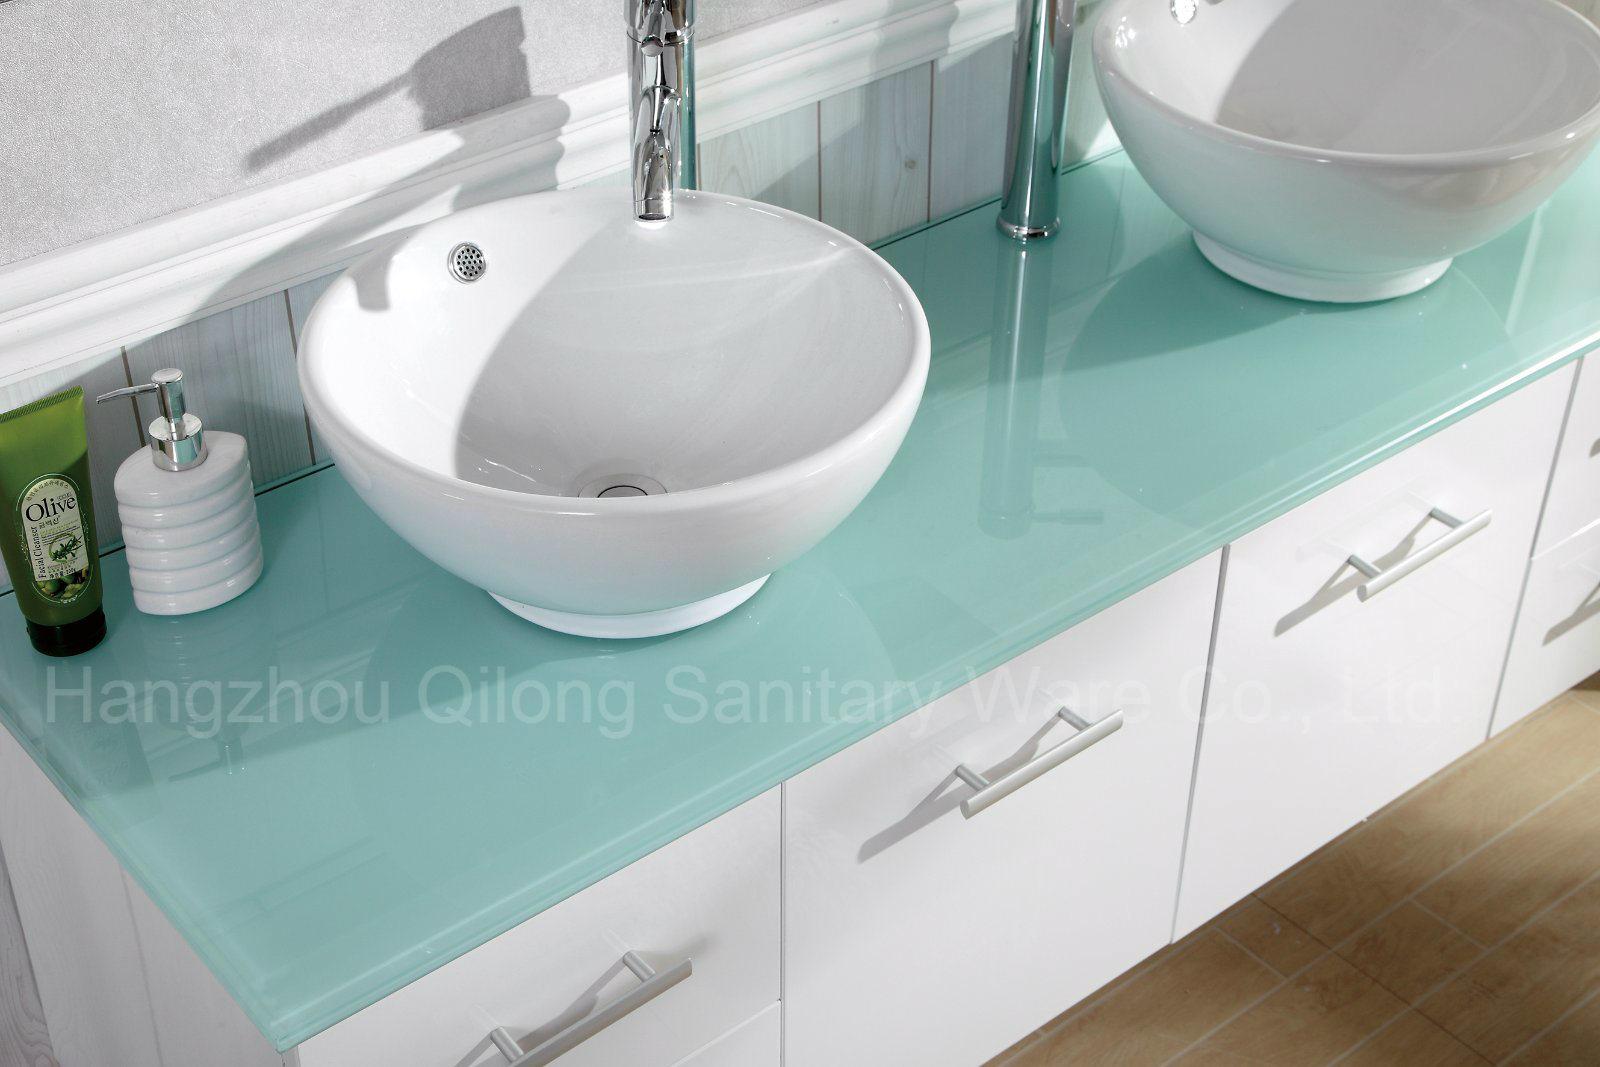 New Style MDF Bathroom Vanity with Ceramic Basin